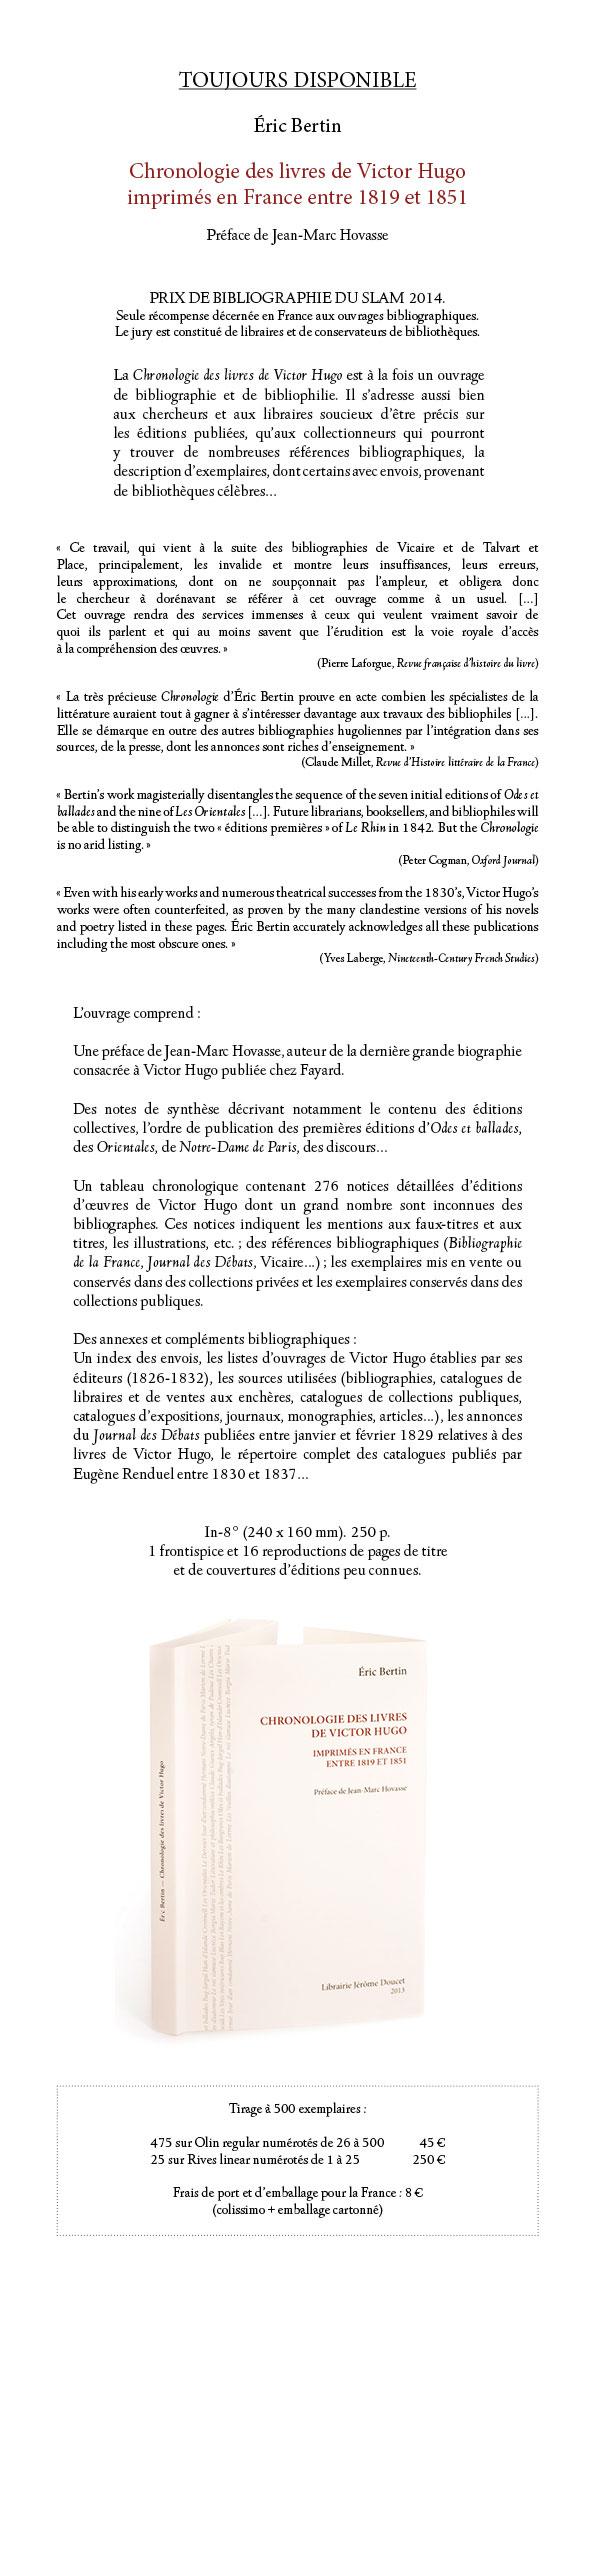 Bertin. Chronologie des livres de Victor Hugo